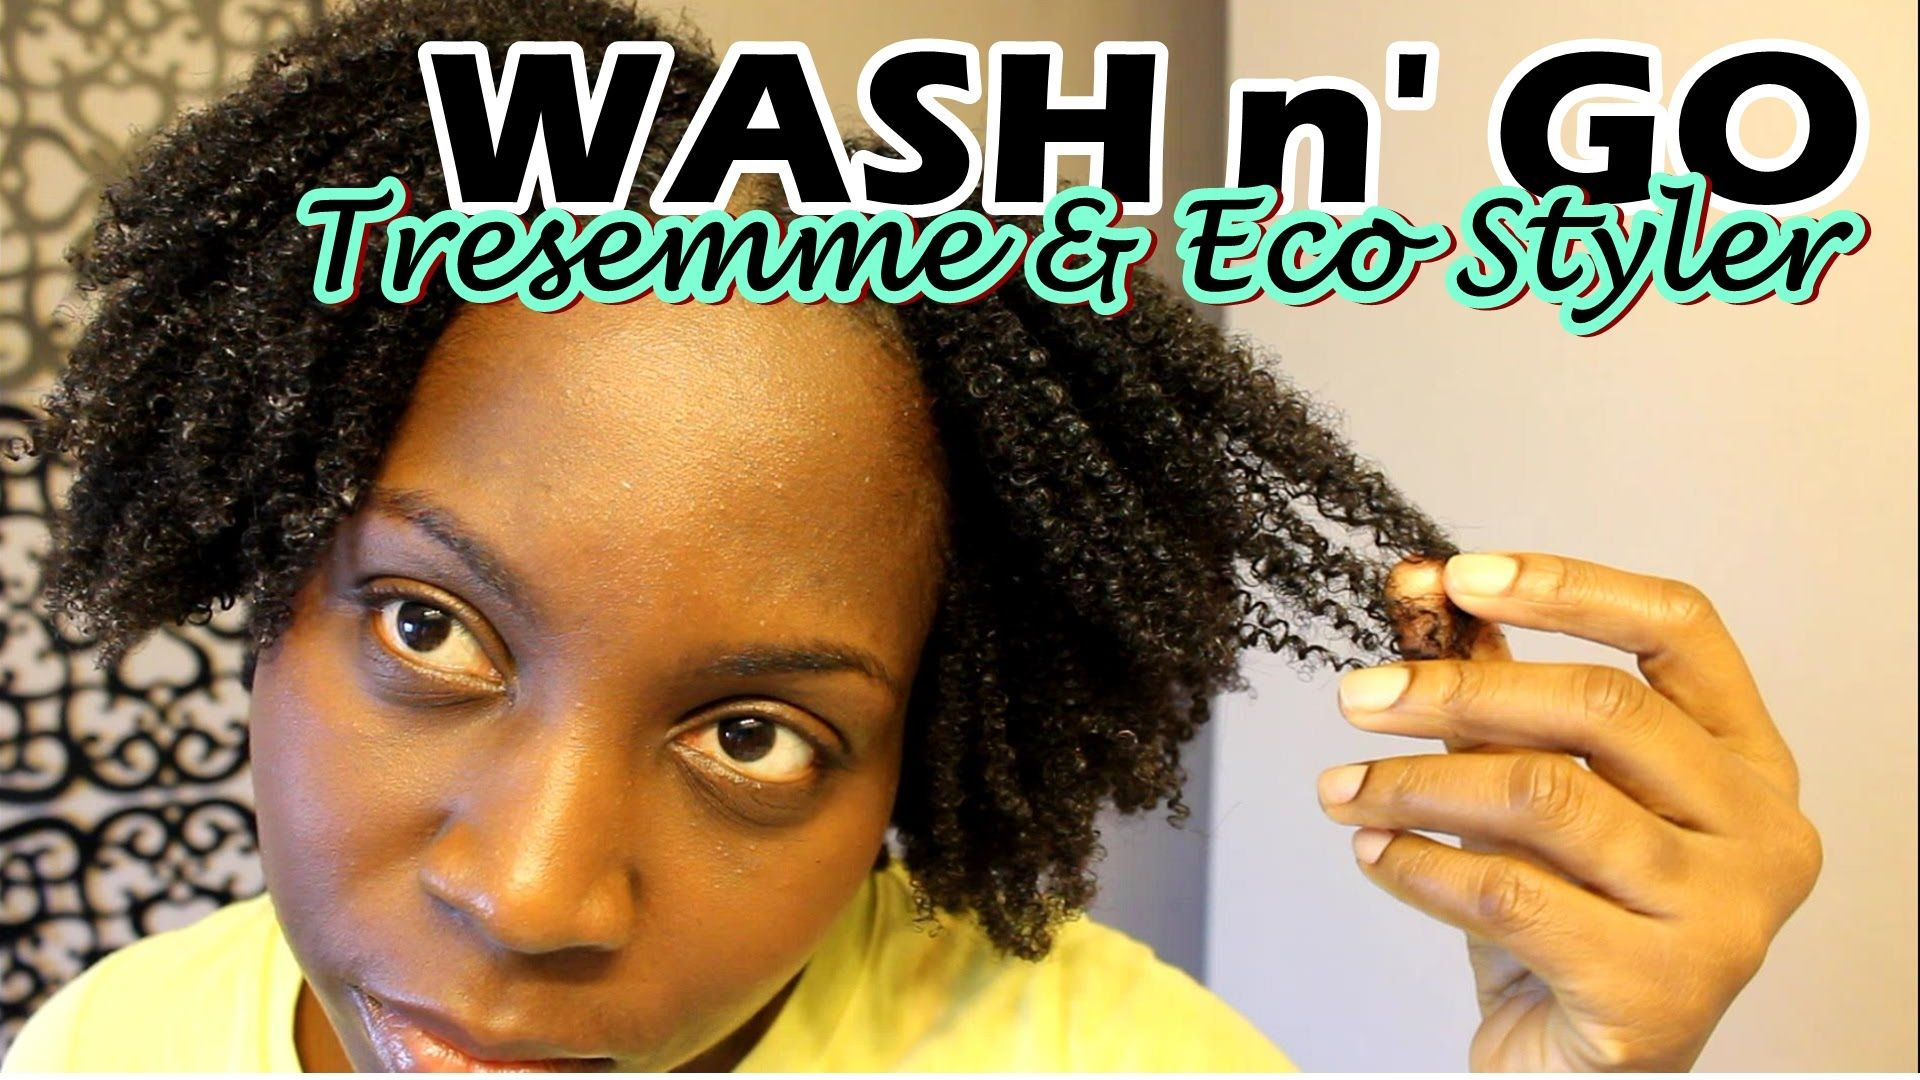 Wash And Go 4b 4c Natural Hair Tresemme Natural And Eco Styler Gel Natural Hair Styles Eco Styler Gel 4c Natural Hair